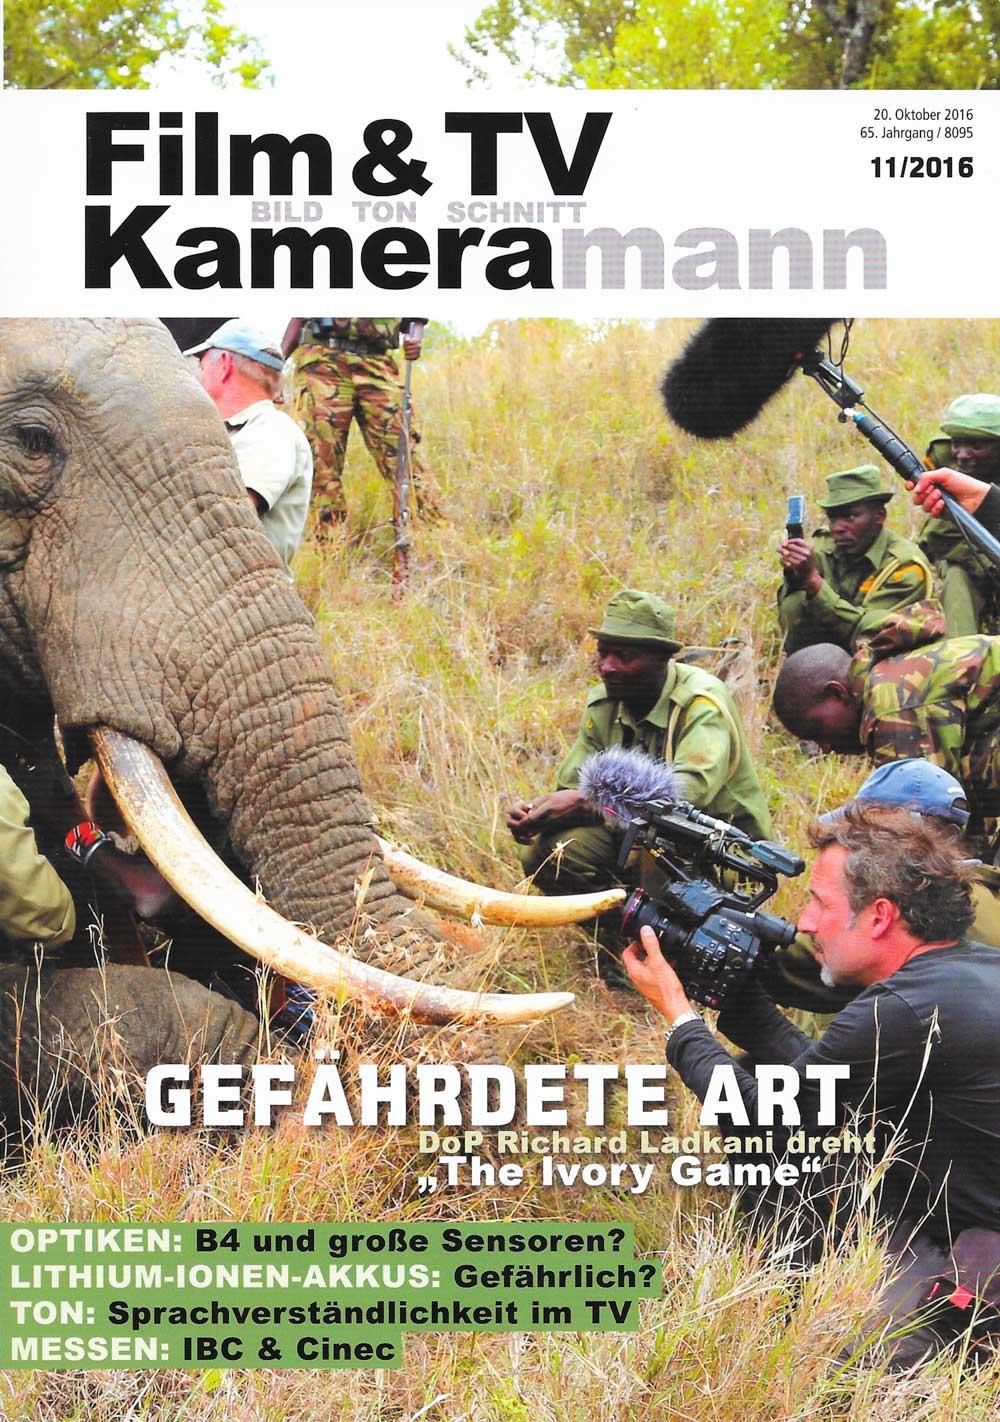 Cinefade---Press---Film-und-TV-Kameramann---cover---web.jpg